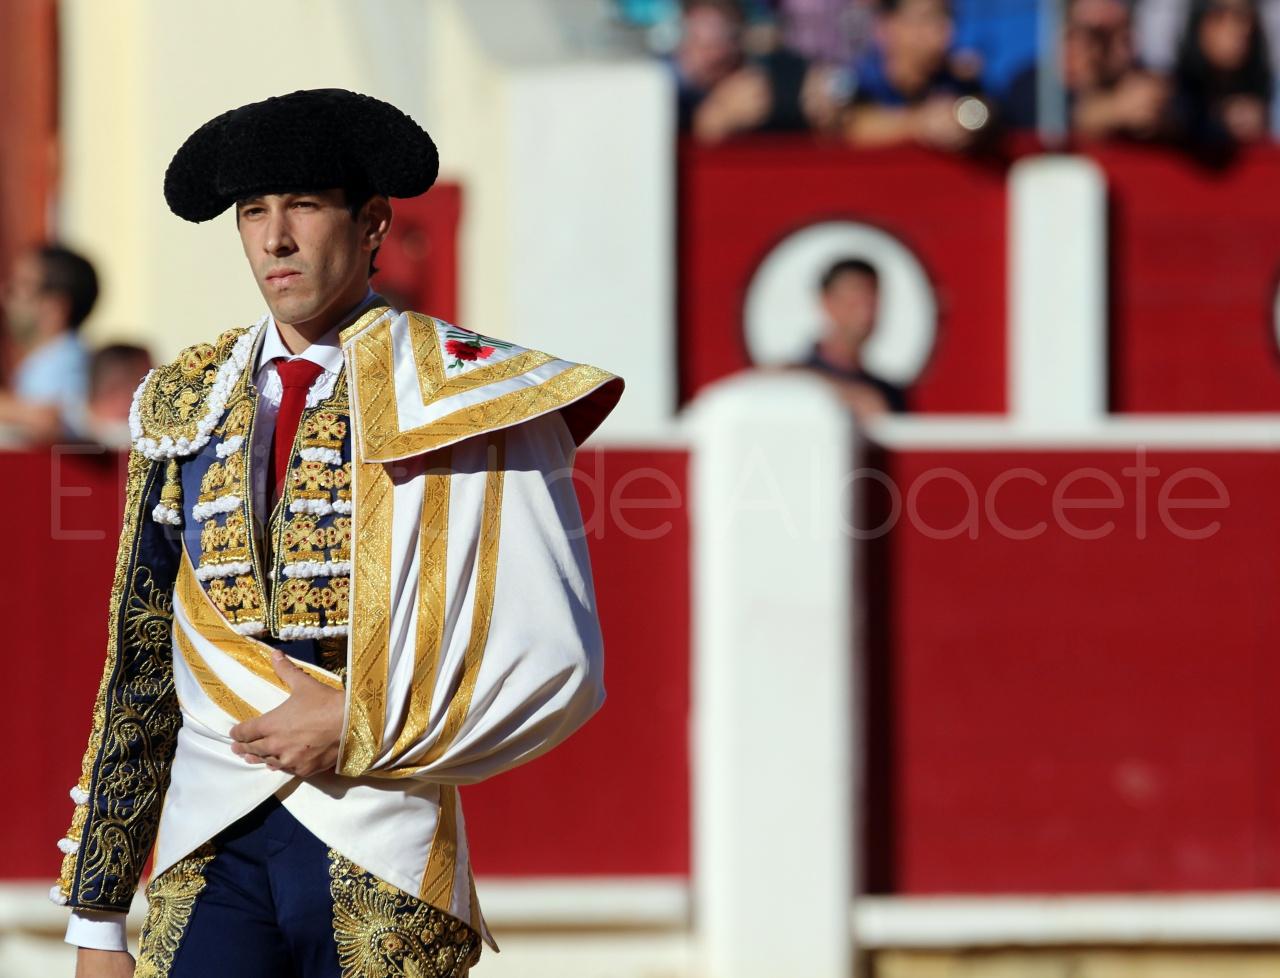 El Juli Lopez Simon y Garrido Feria Albacete 2015 toros  13